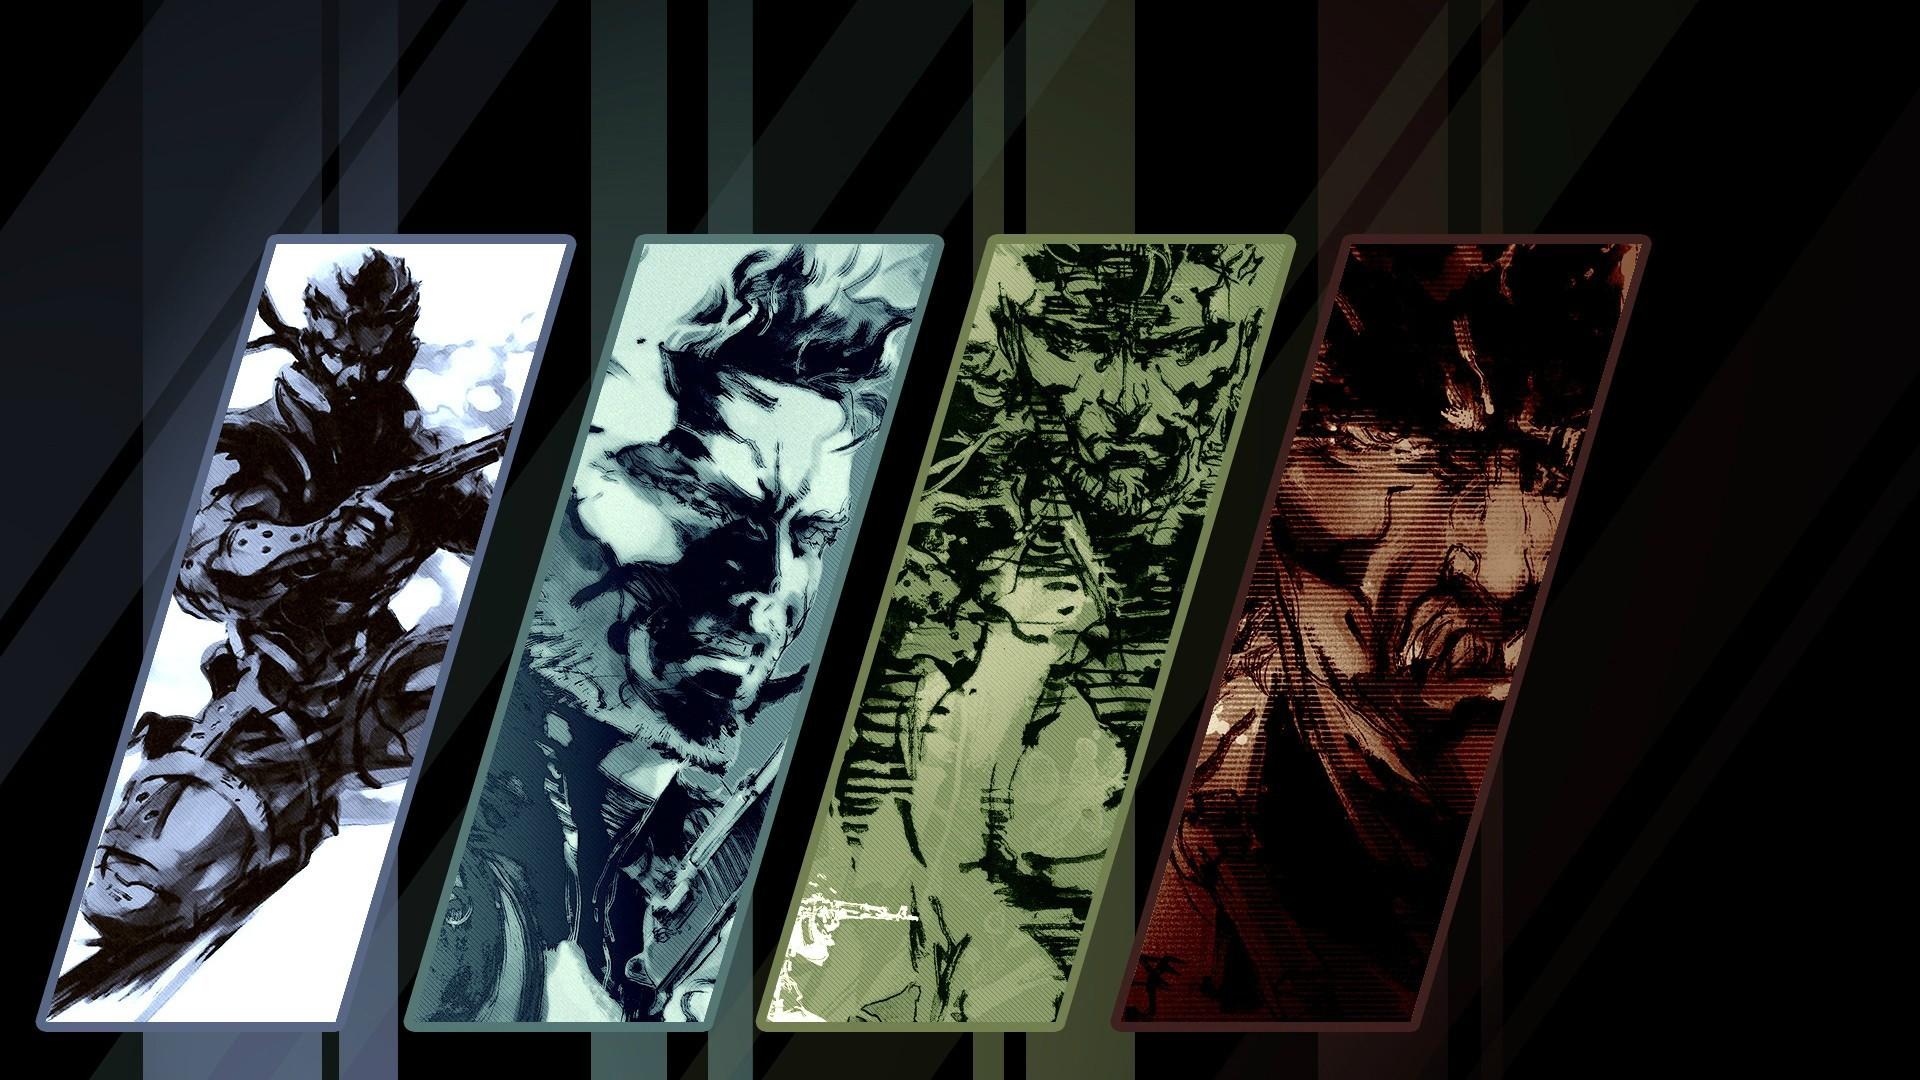 Metal Gear Solid Wallpaper Dump